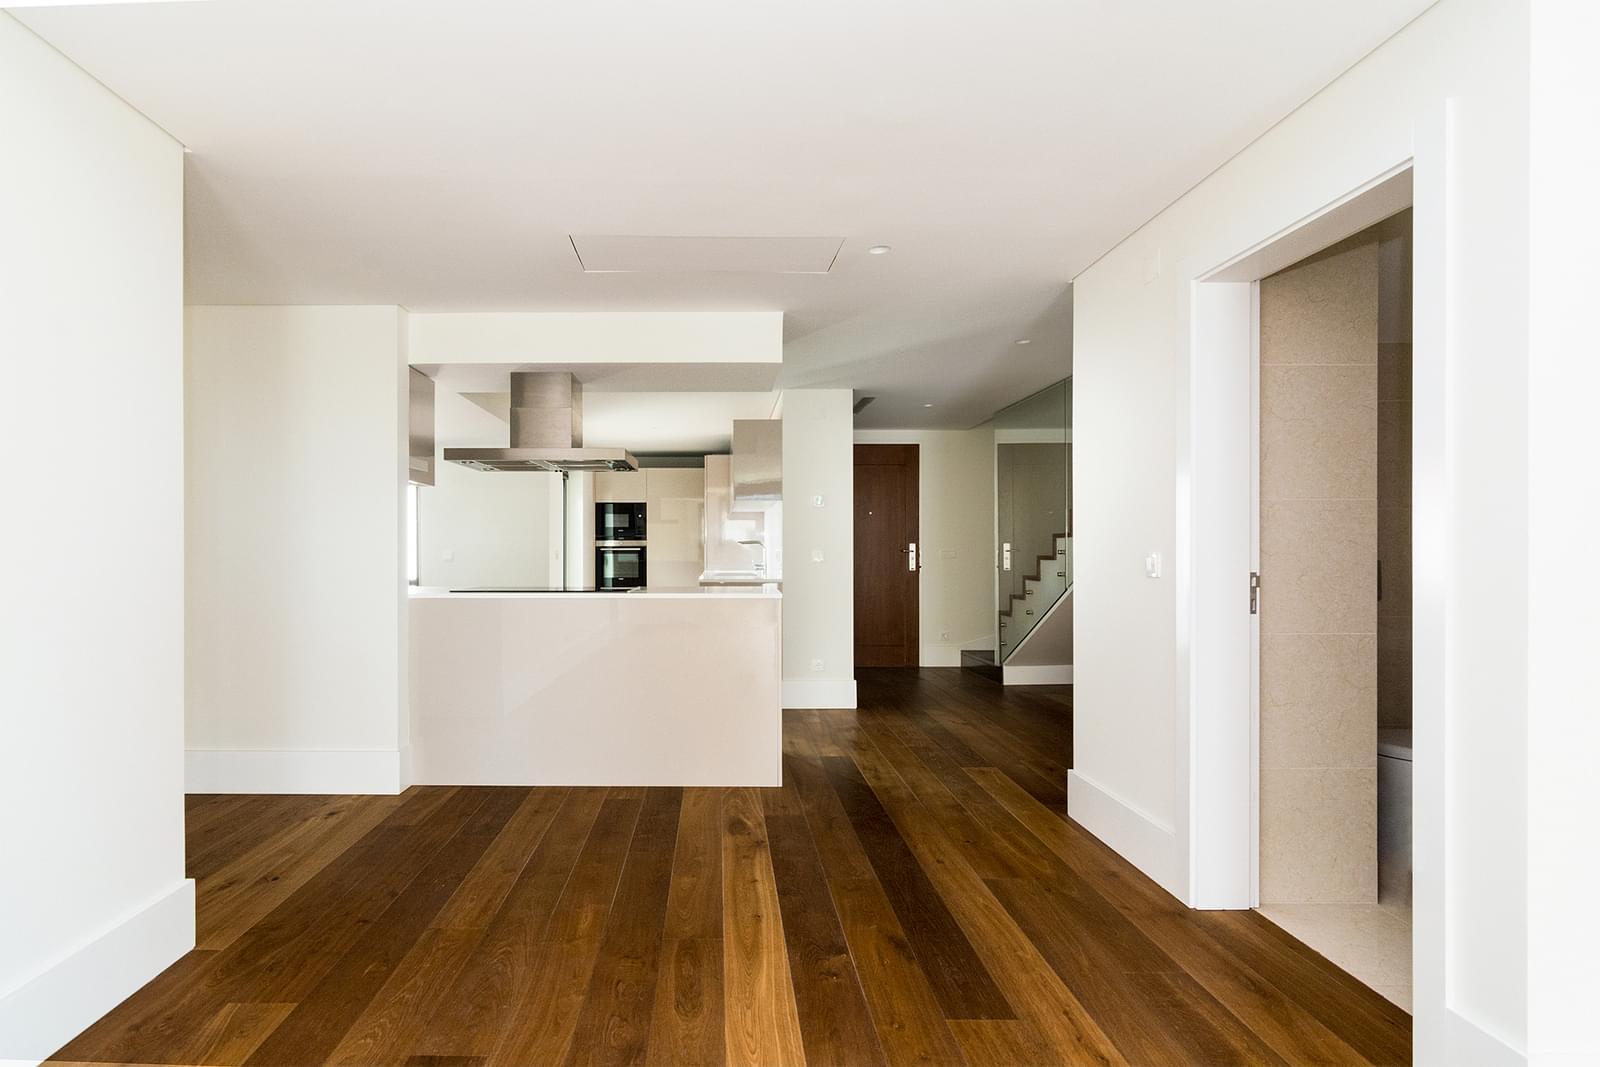 pf17442-apartamento-t3-lisboa-14eef3e9-3ad4-4404-9123-17a61de86054